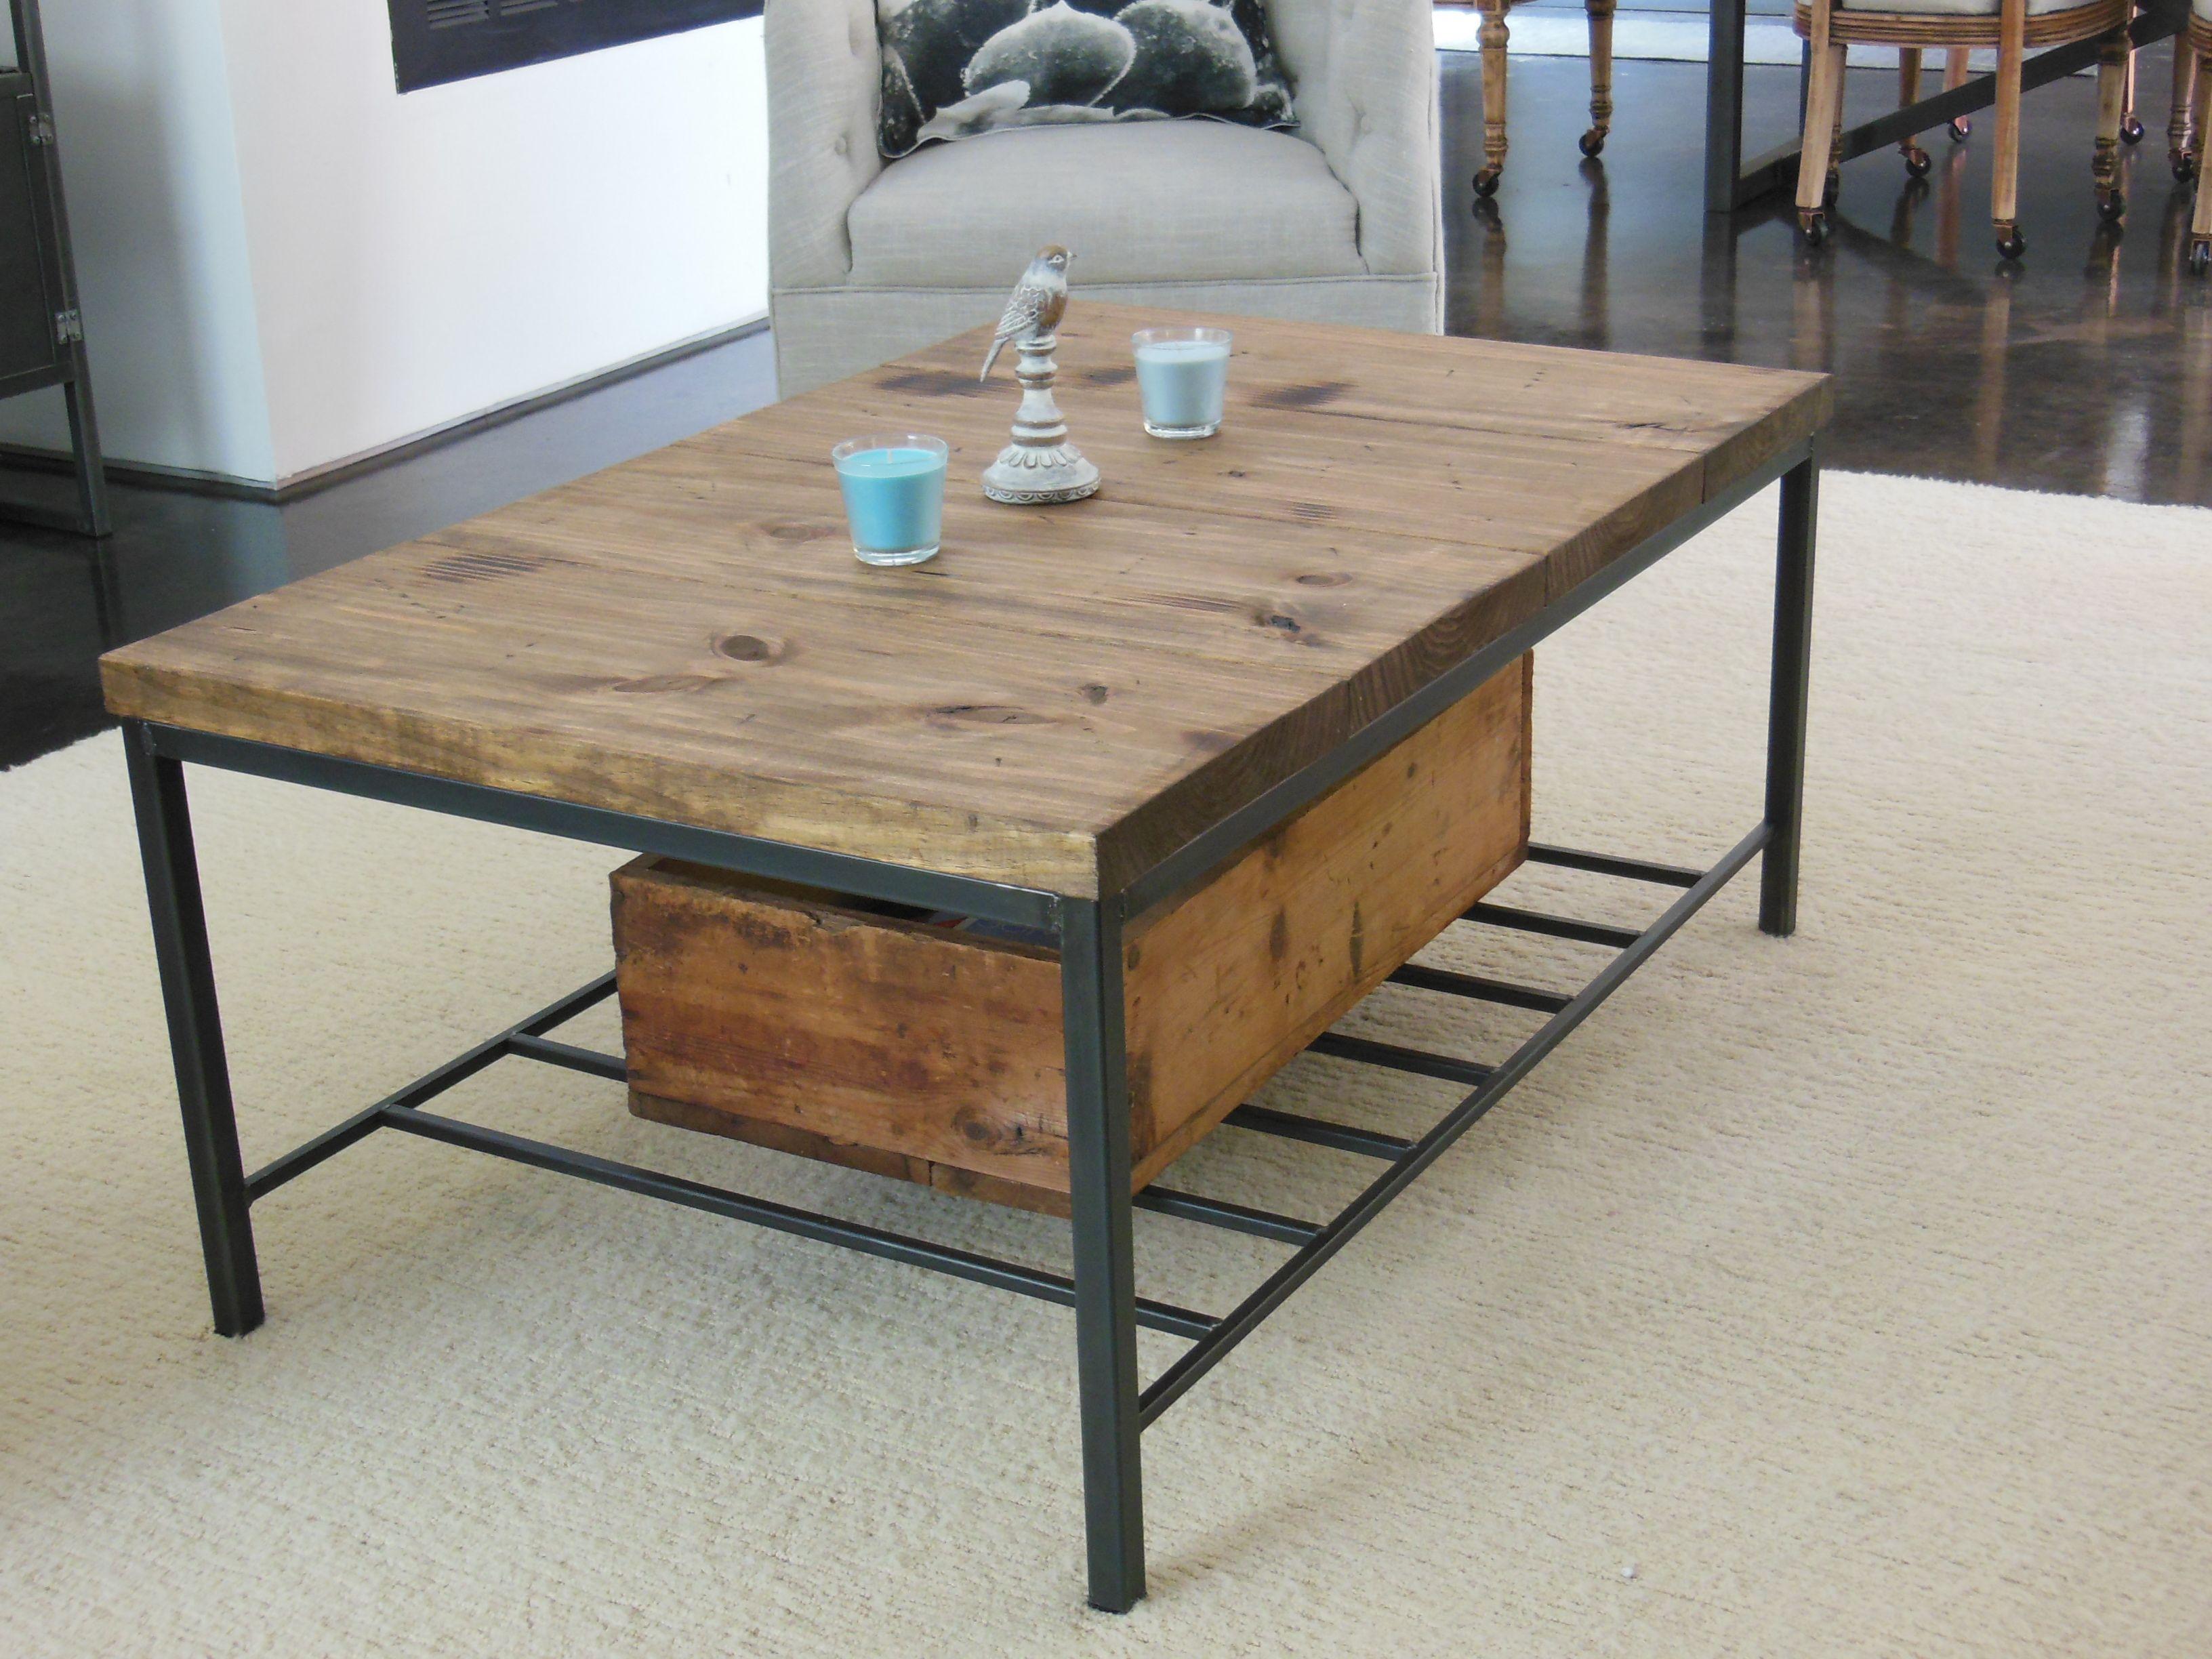 Atico Furniture Slim Coffee Table Custom Made Furniture Coffee Table Decor [ 2448 x 3264 Pixel ]